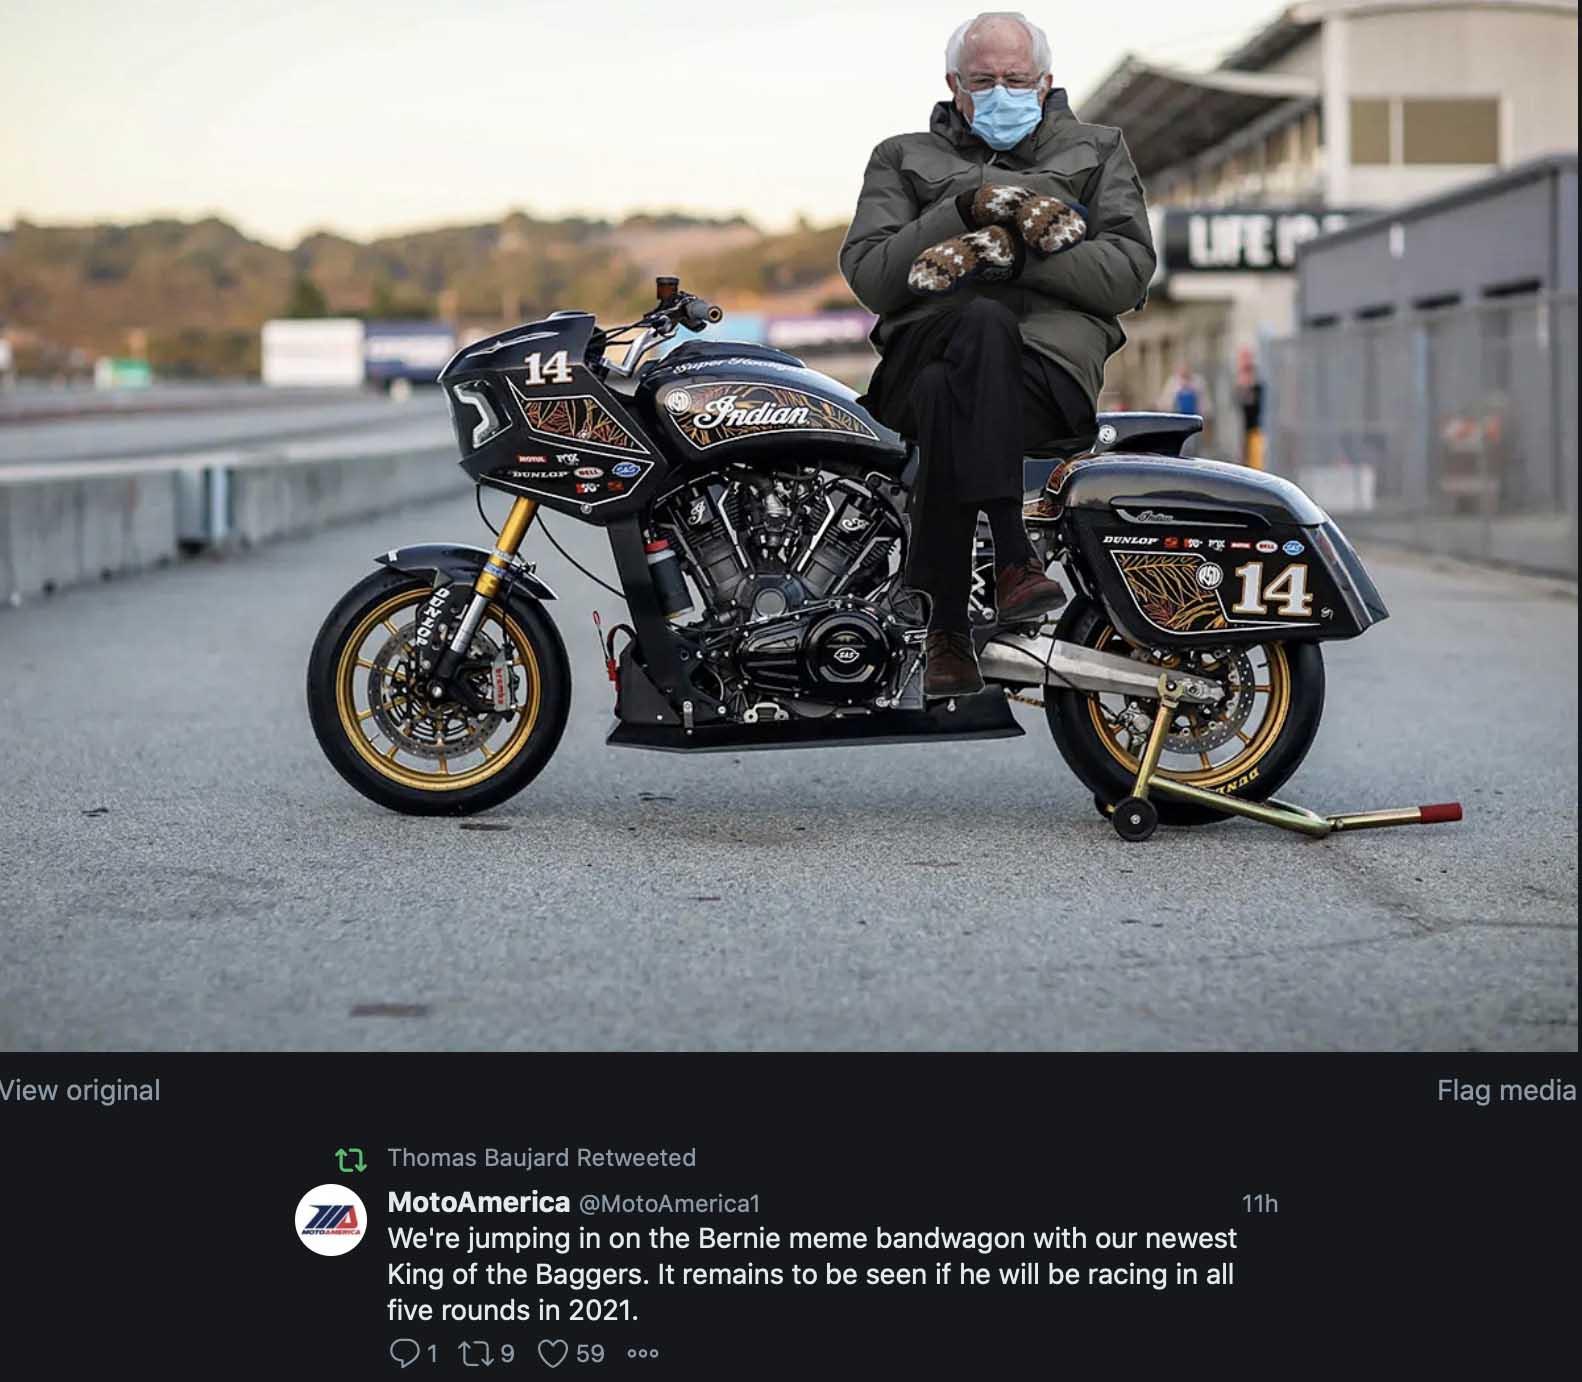 Motoamerica Bernie Sanders Wildcard In King Of Baggers In Motoamerica Or At Vallelunga Gpone Com